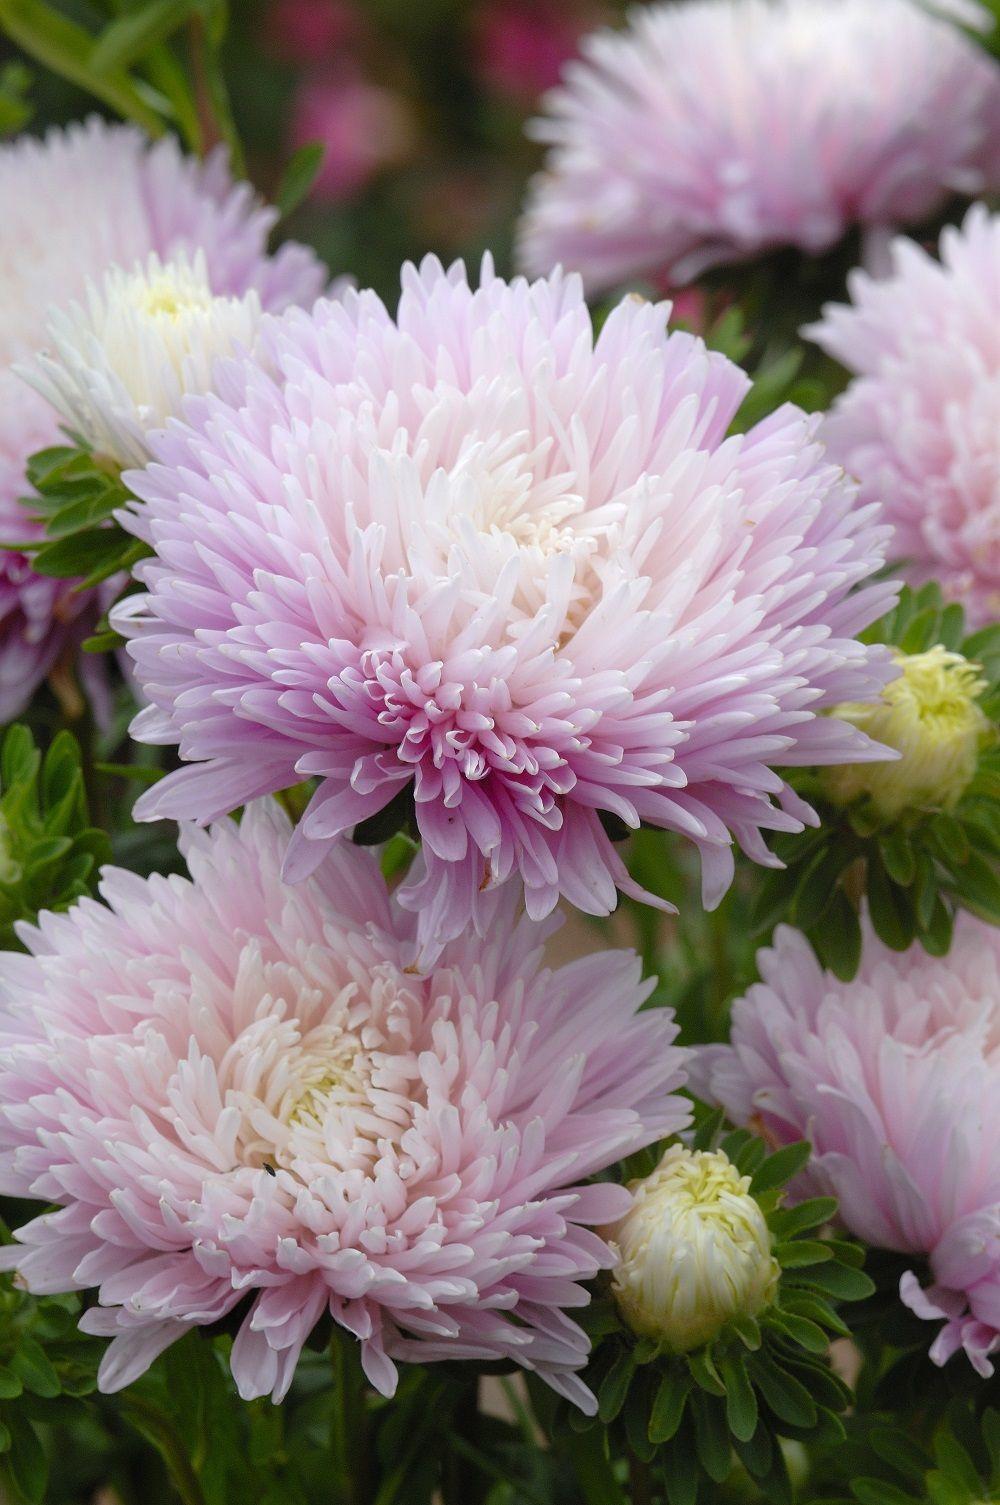 King Size Appleblossom Aster Callistephus Chinensis Flower Pots Flowers Seed Catalogs